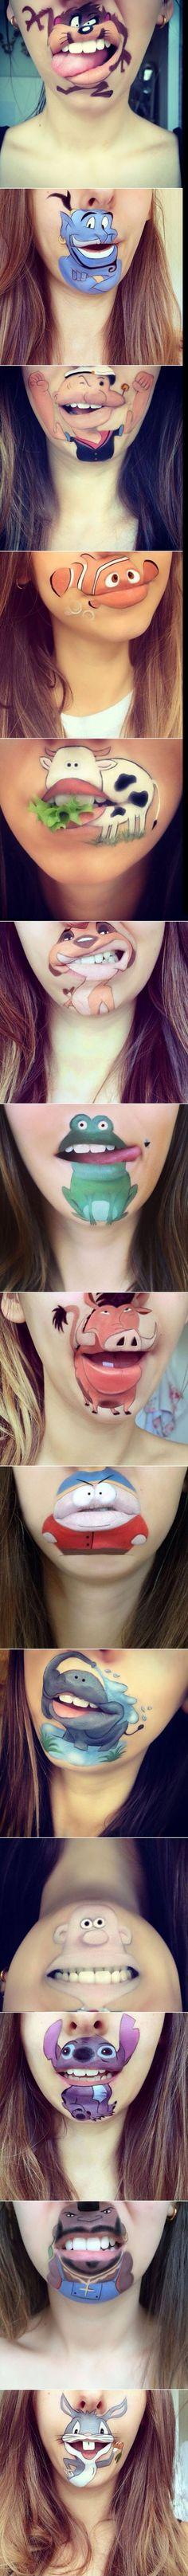 Cartoon-Figuren, wie man sie nicht erwartet Disney Eye Makeup, Creative Halloween Costumes, Halloween Makeup, Makeup Art, Lip Makeup, Dramatic Makeup, Creative Makeup, Bodypainting, Costume Makeup